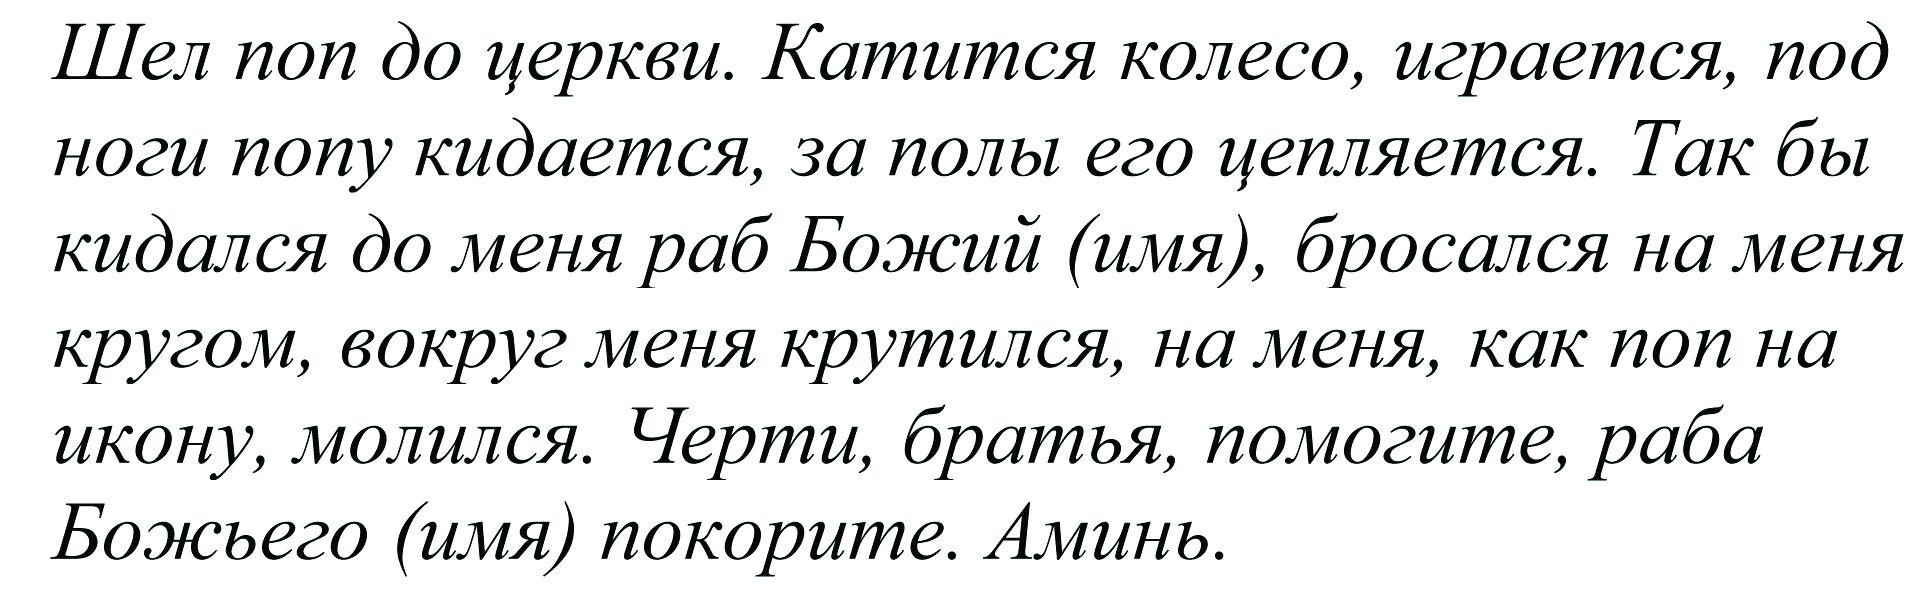 Fortochka